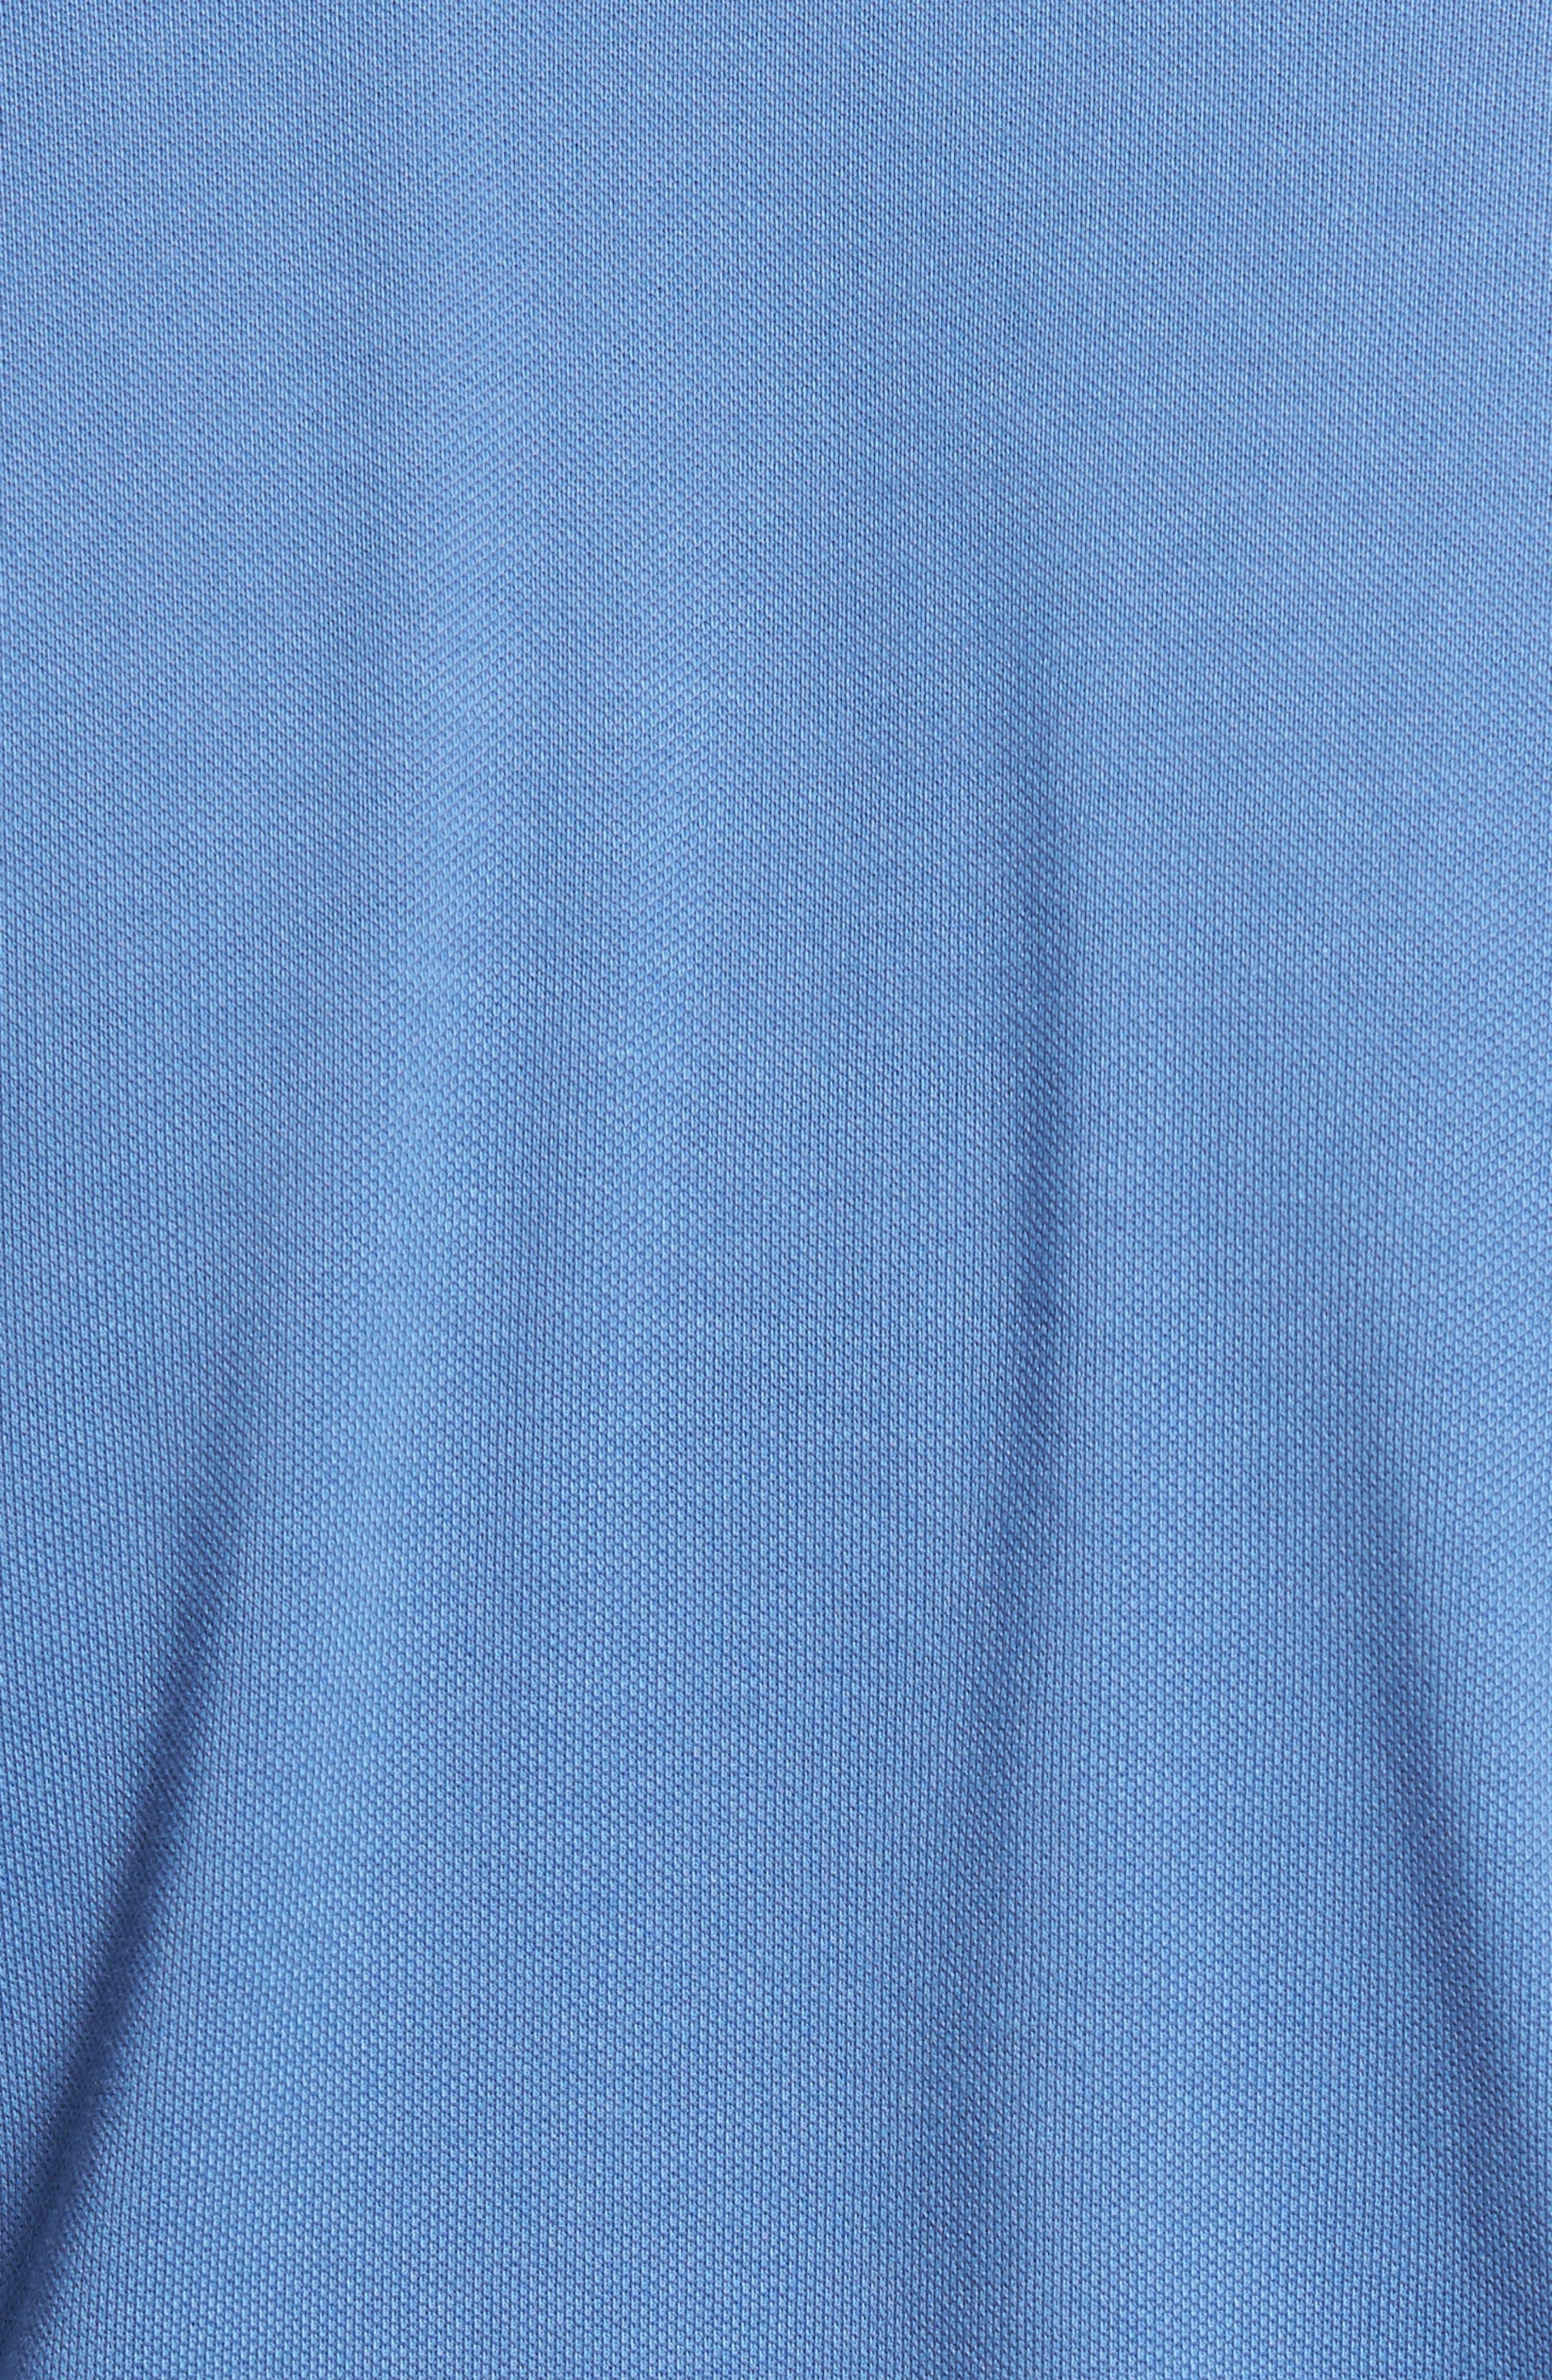 Advantage Golf Polo,                             Alternate thumbnail 5, color,                             SEA BLUE